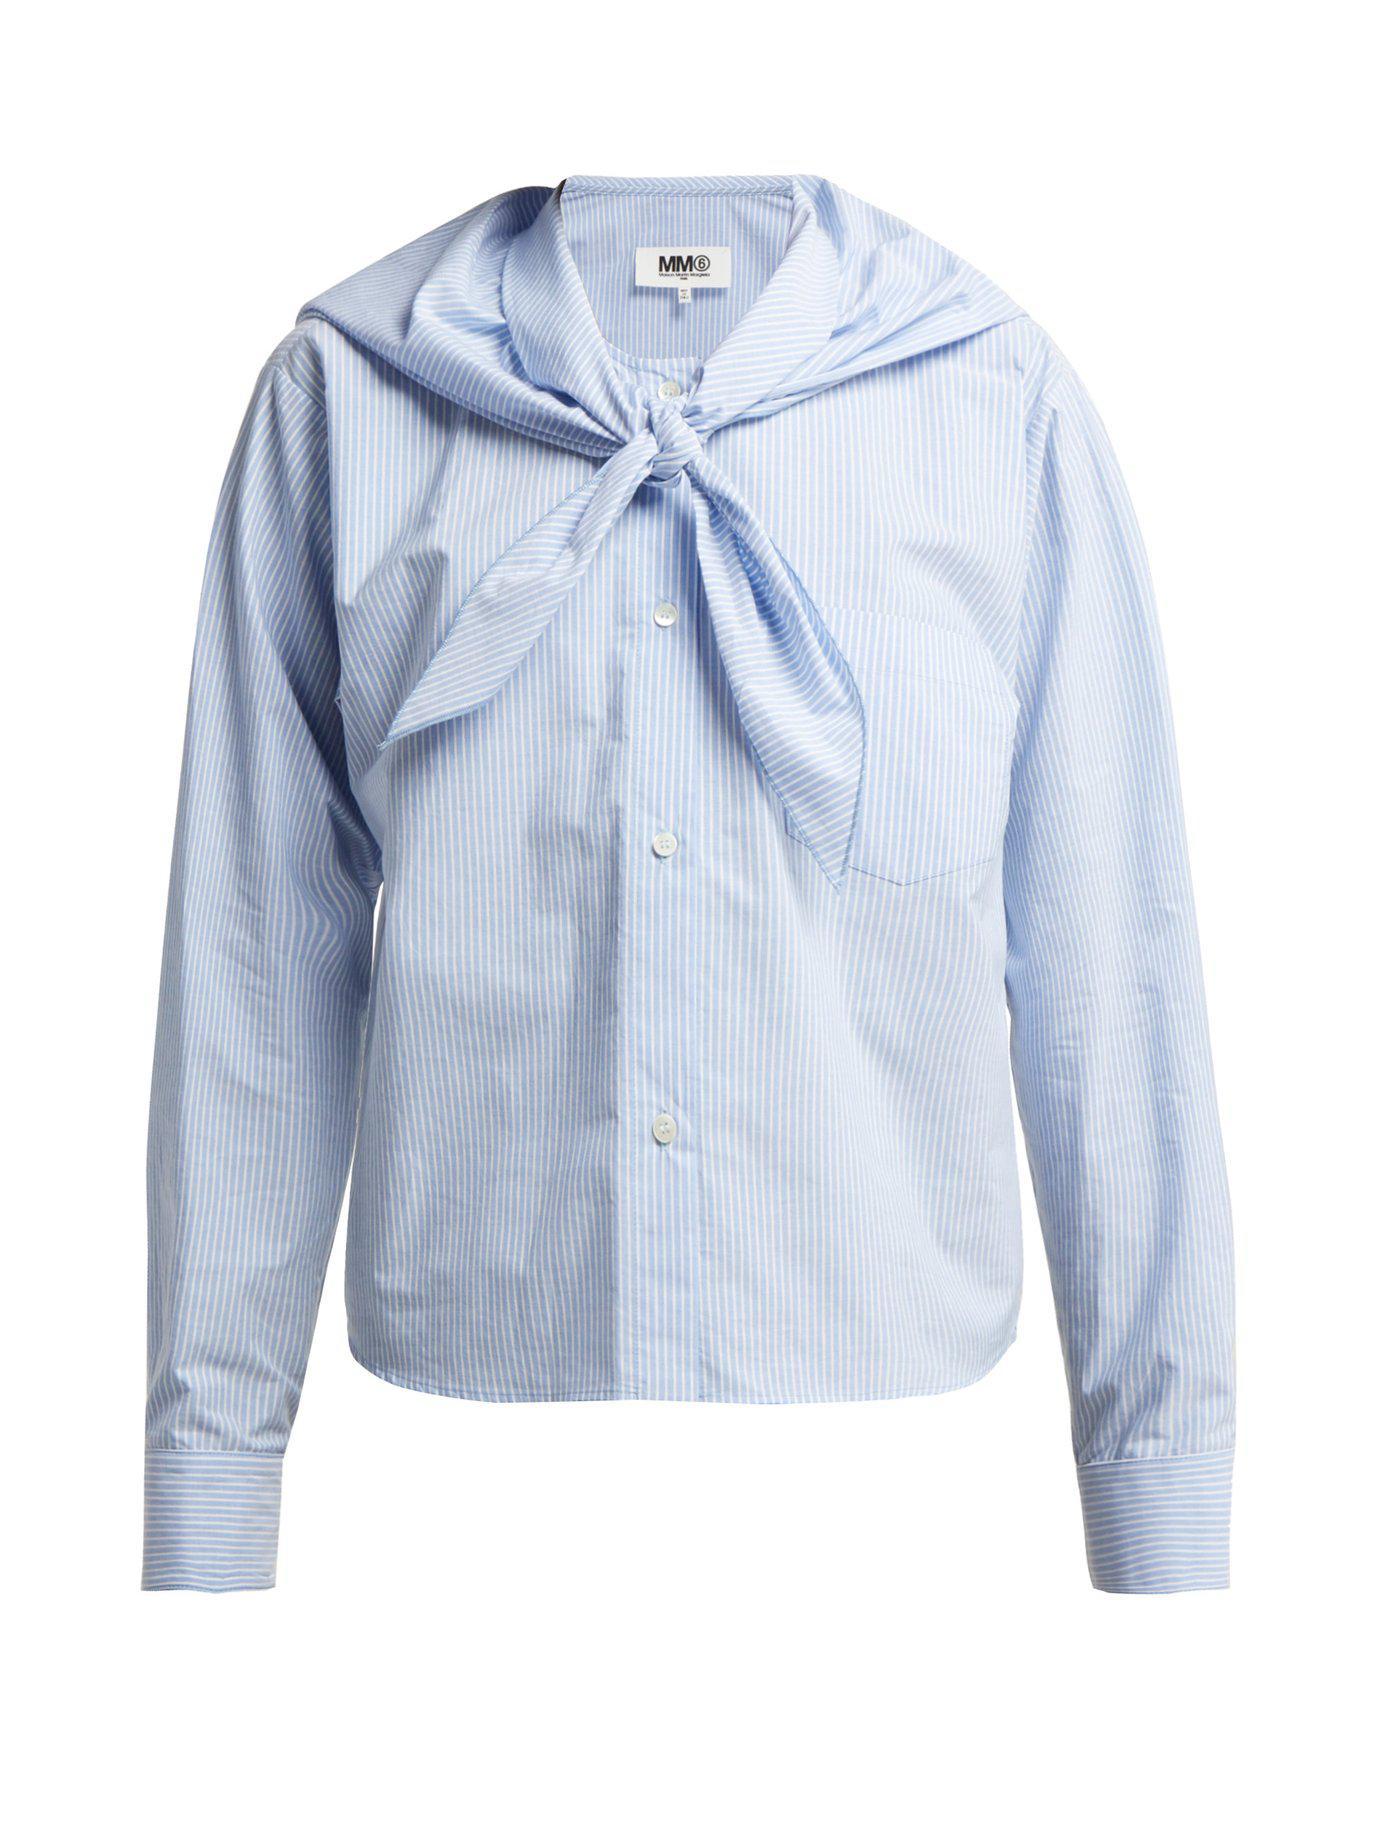 5008f61818819 Lyst - MM6 by Maison Martin Margiela Tie Front Cotton Poplin Shirt ...